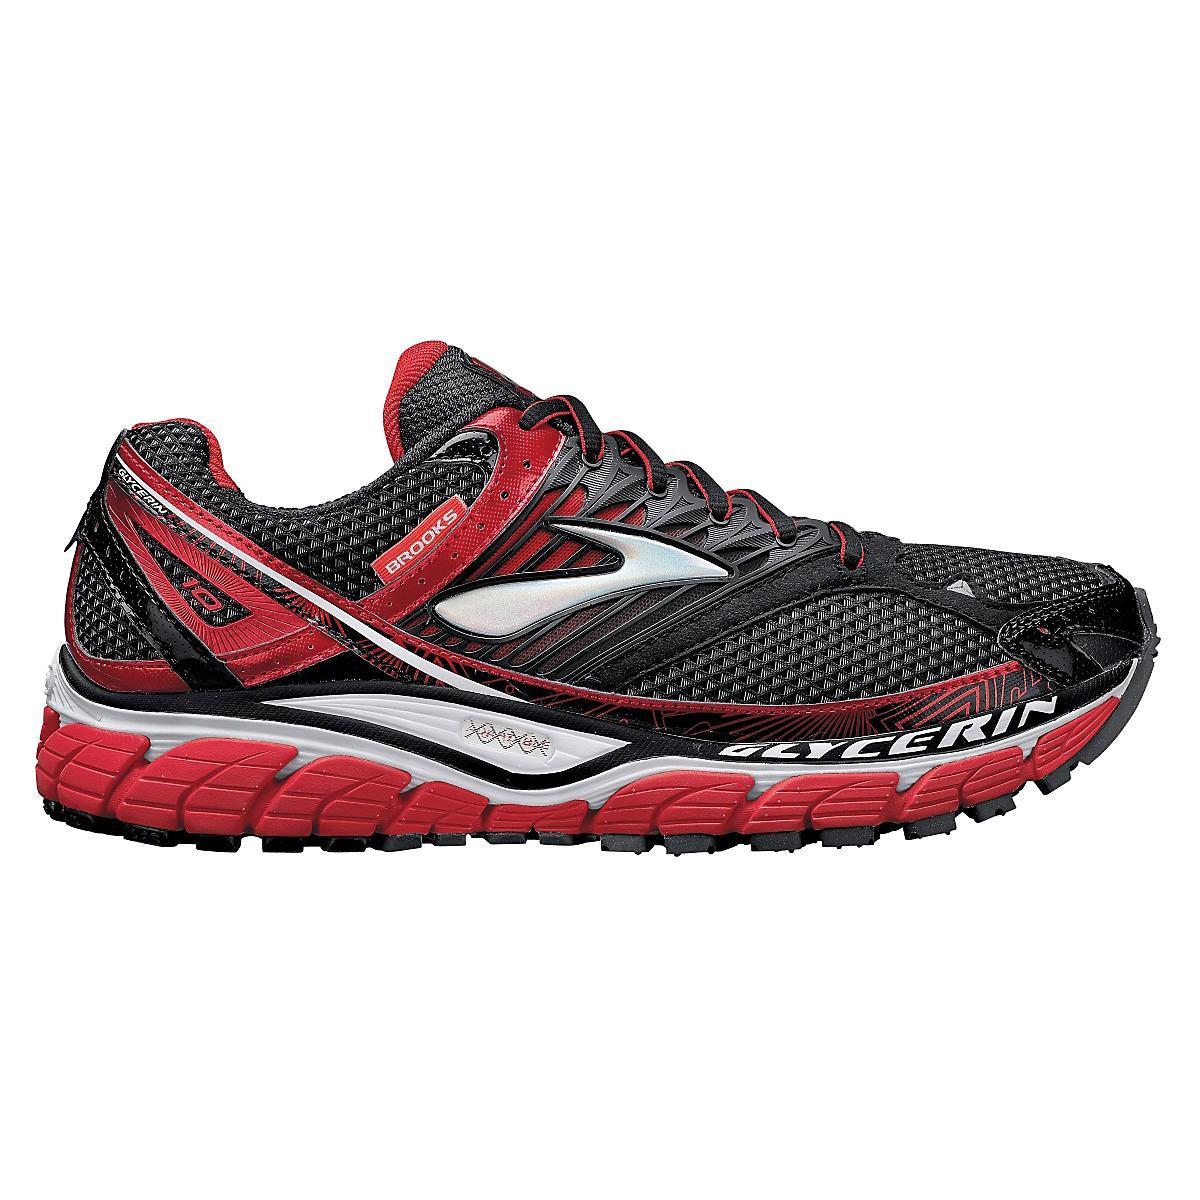 fa8f5bfa943 Mens Brooks Glycerin 10 Running Shoe at Road Runner Sports